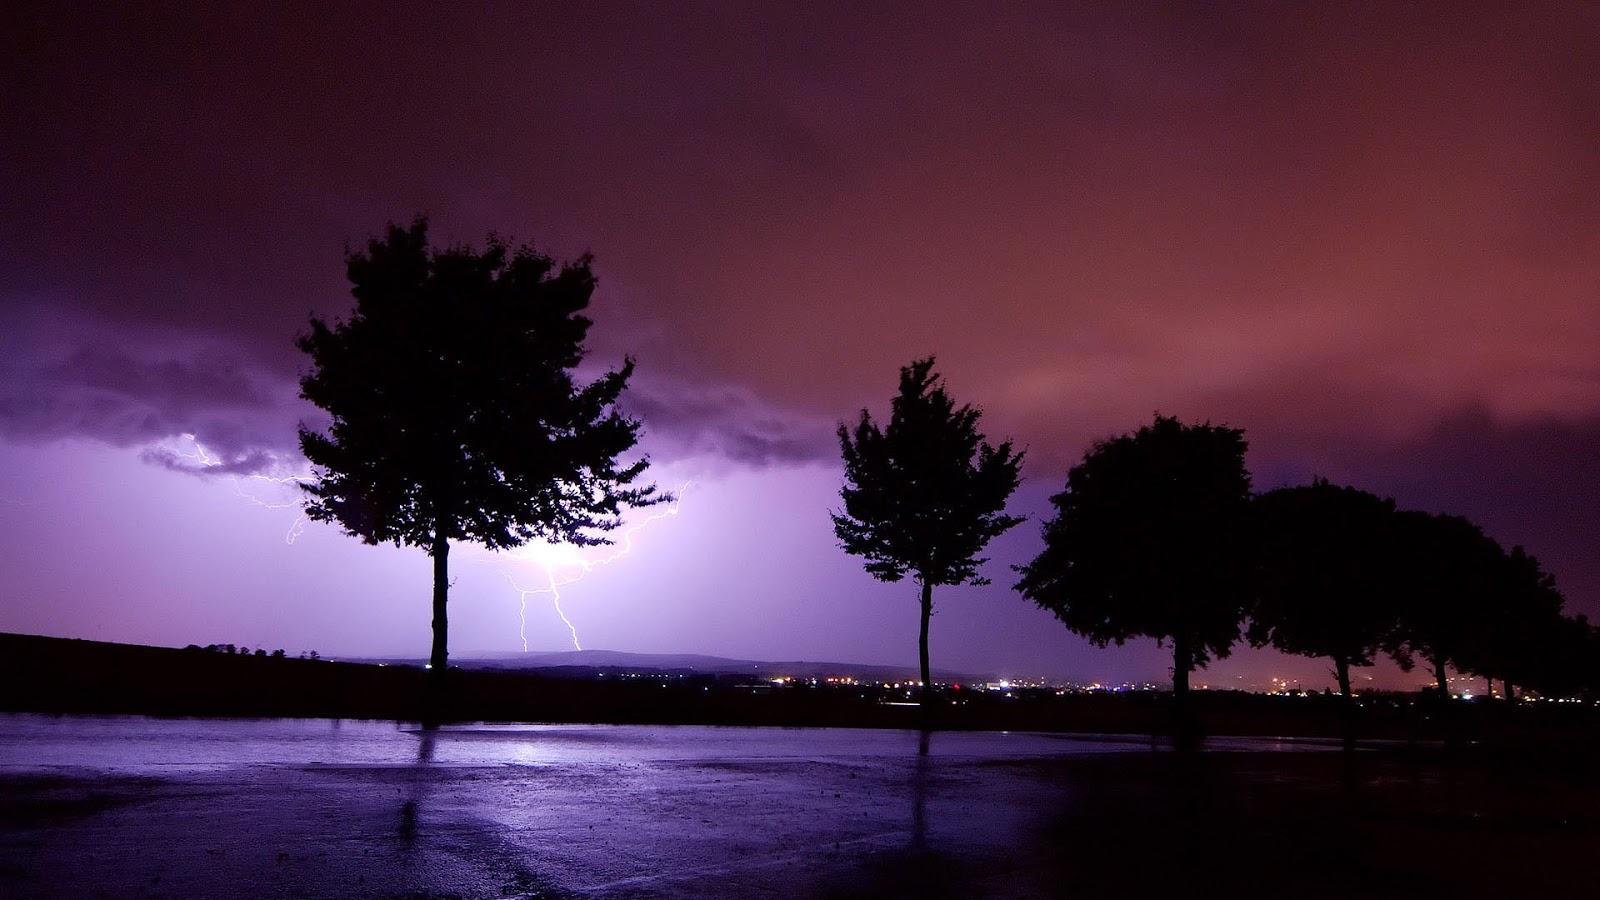 Lightning in Distant